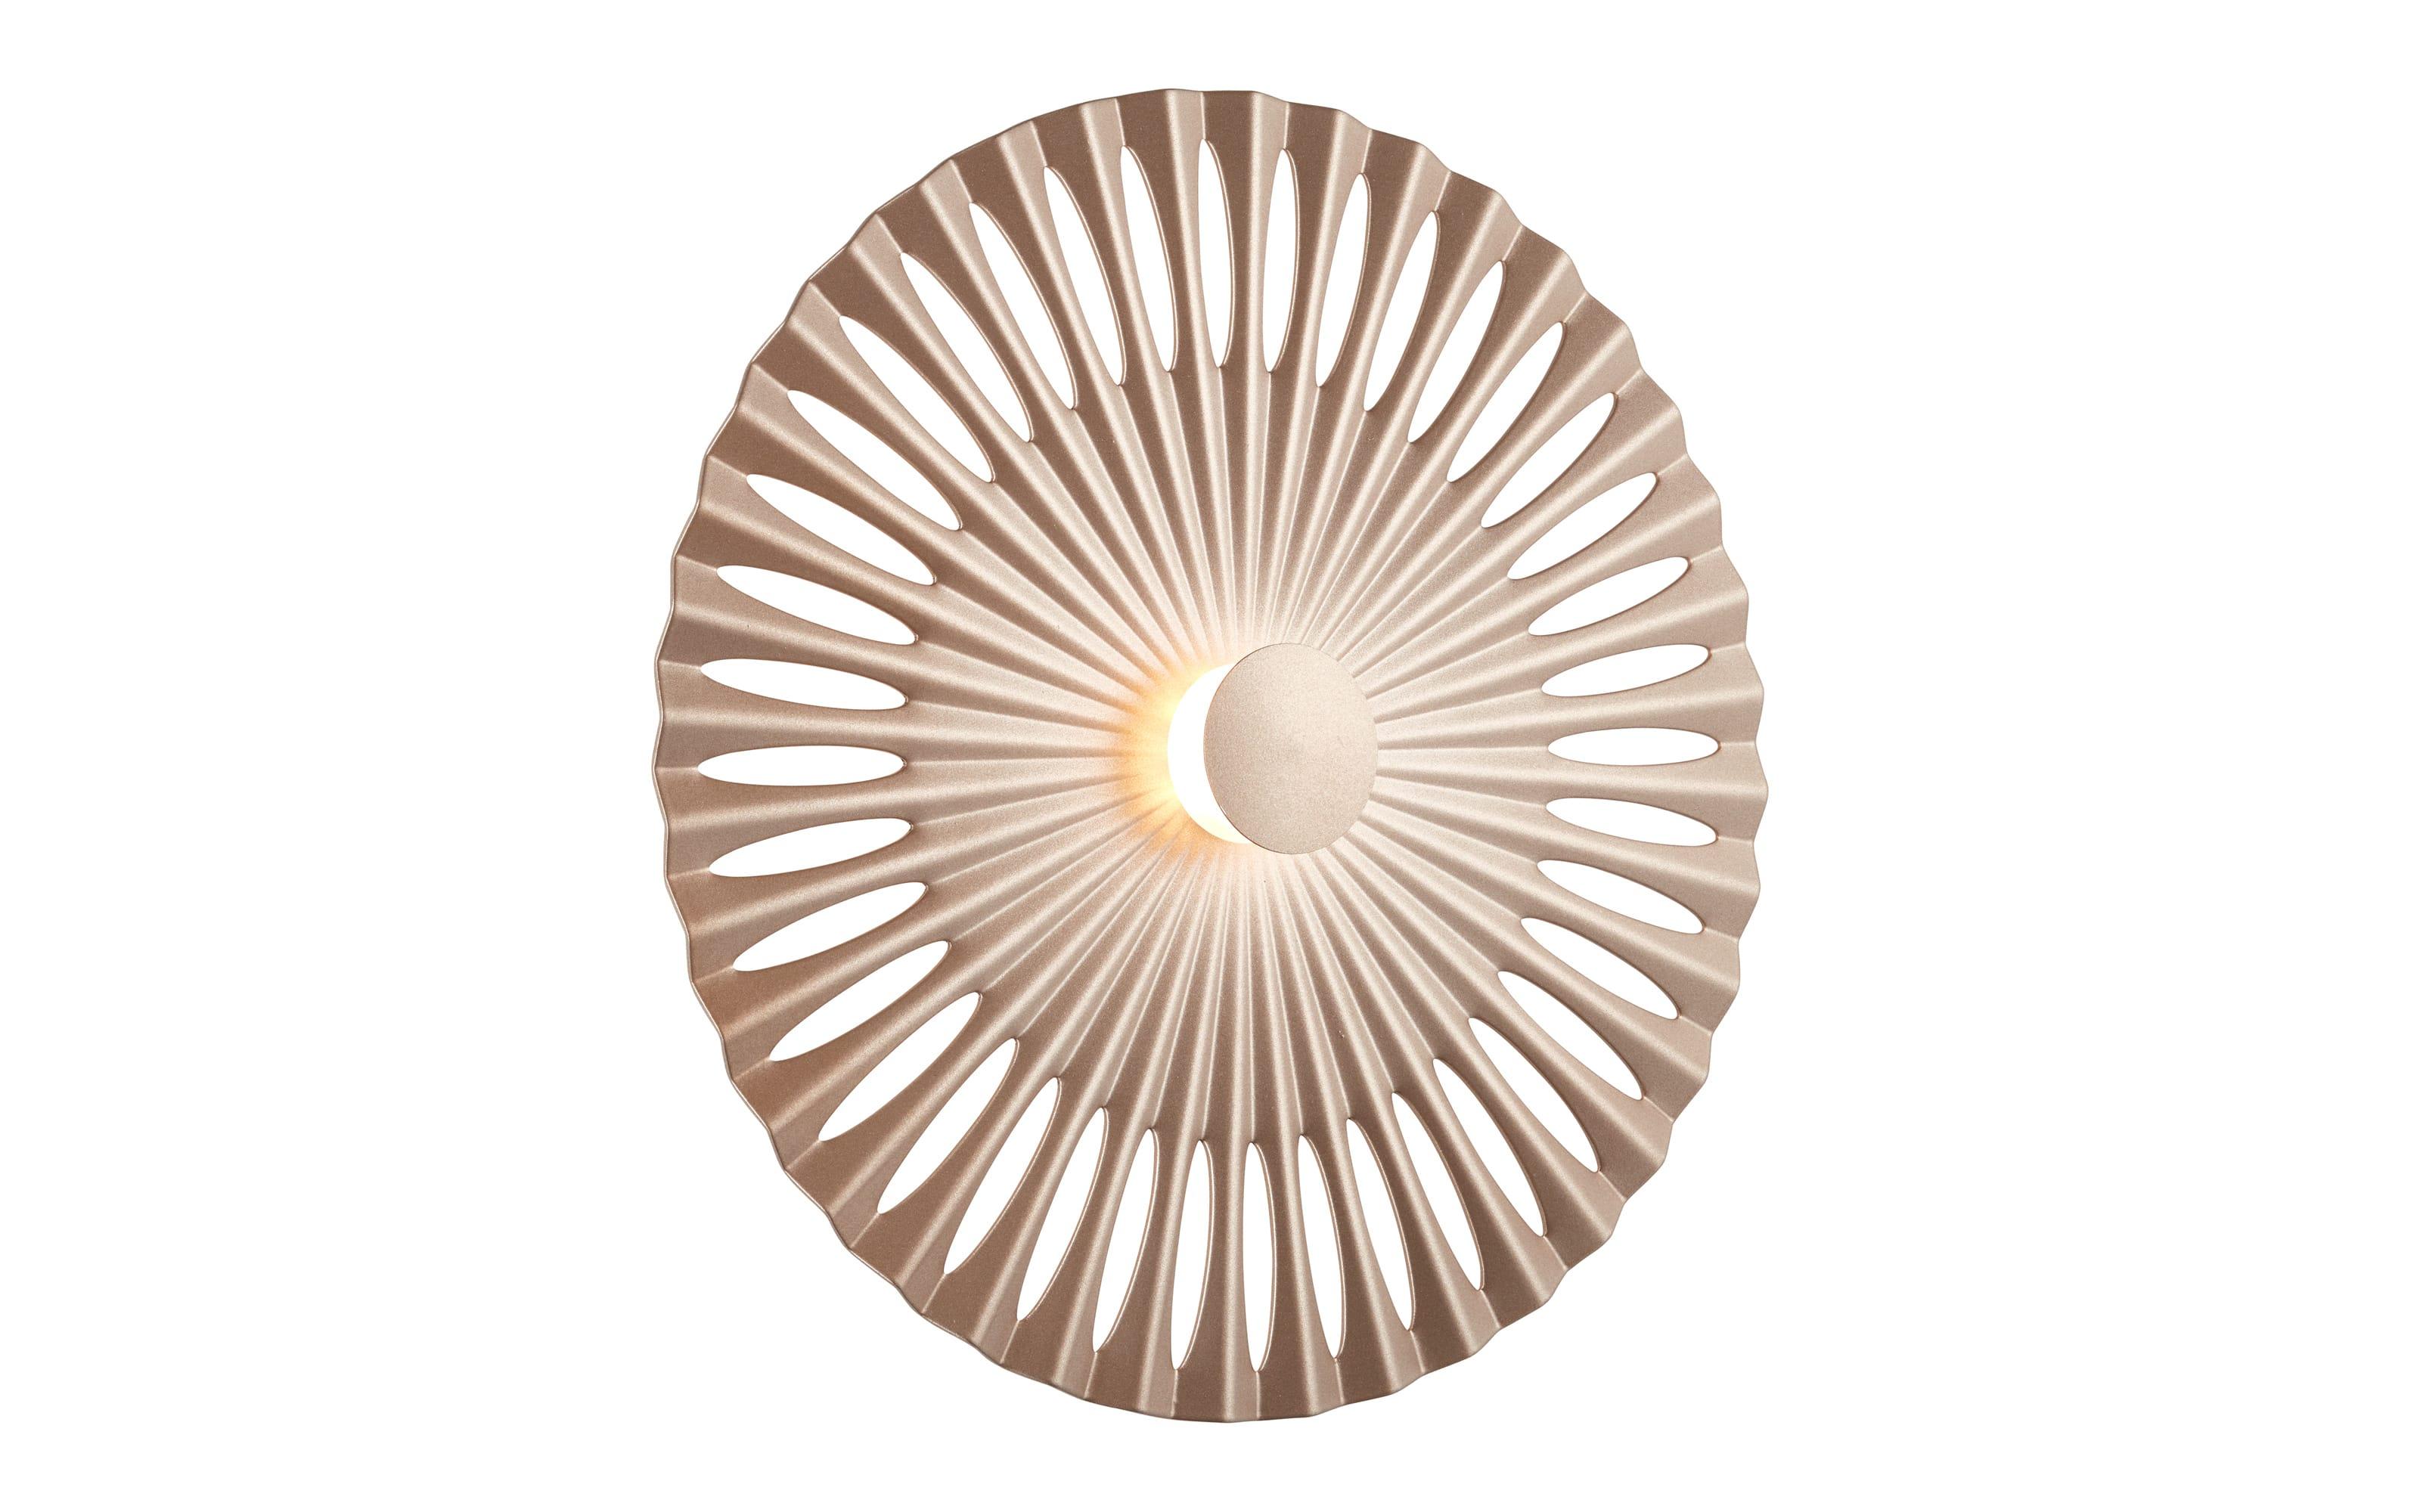 LED-Wandleuchte Phinx in braun